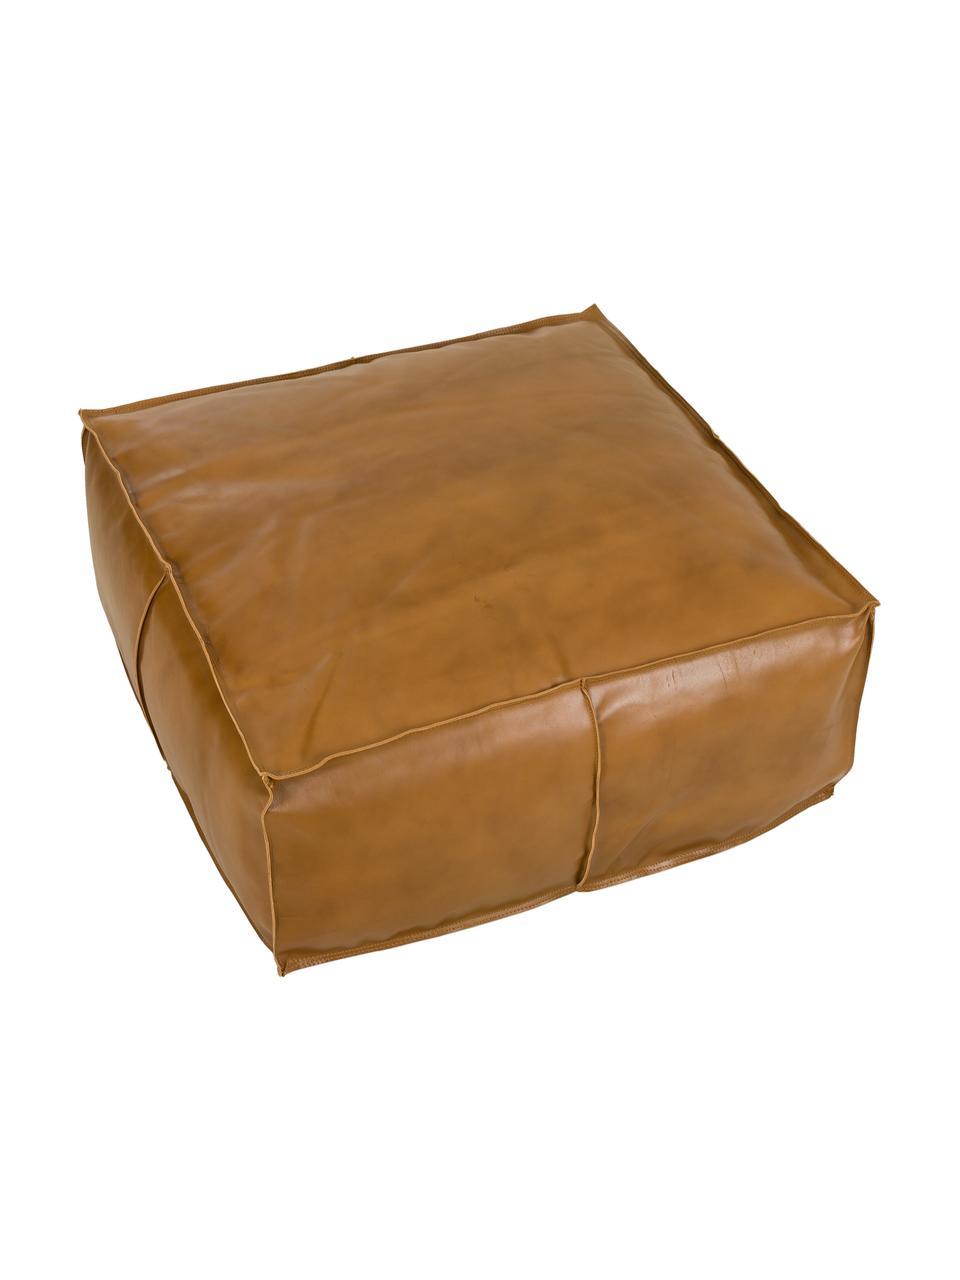 Großer Leder-Pouf Arabica, Bezug: Leder, Unterseite: Baumwolle, Cognac, 70 x 30 cm